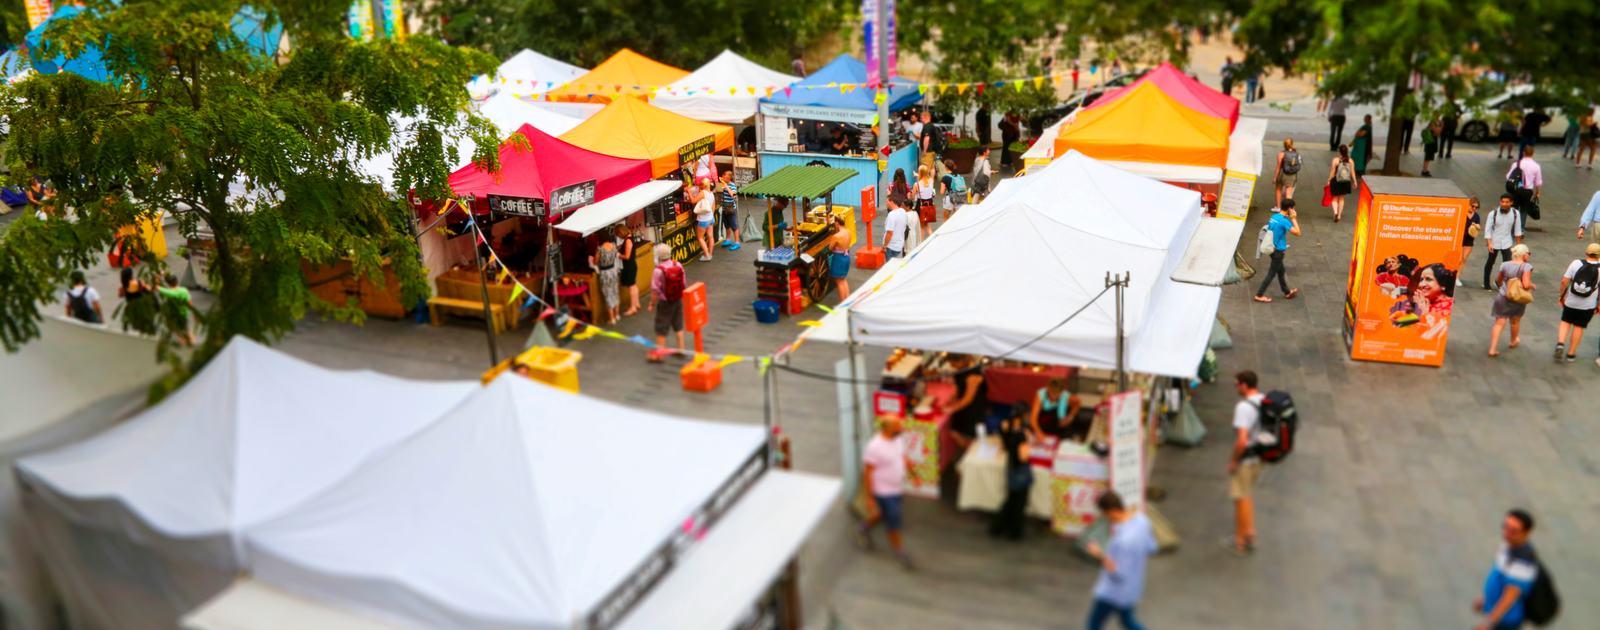 Southbank Centre Food Market.Aerial Tilt Shift Views.August 2016